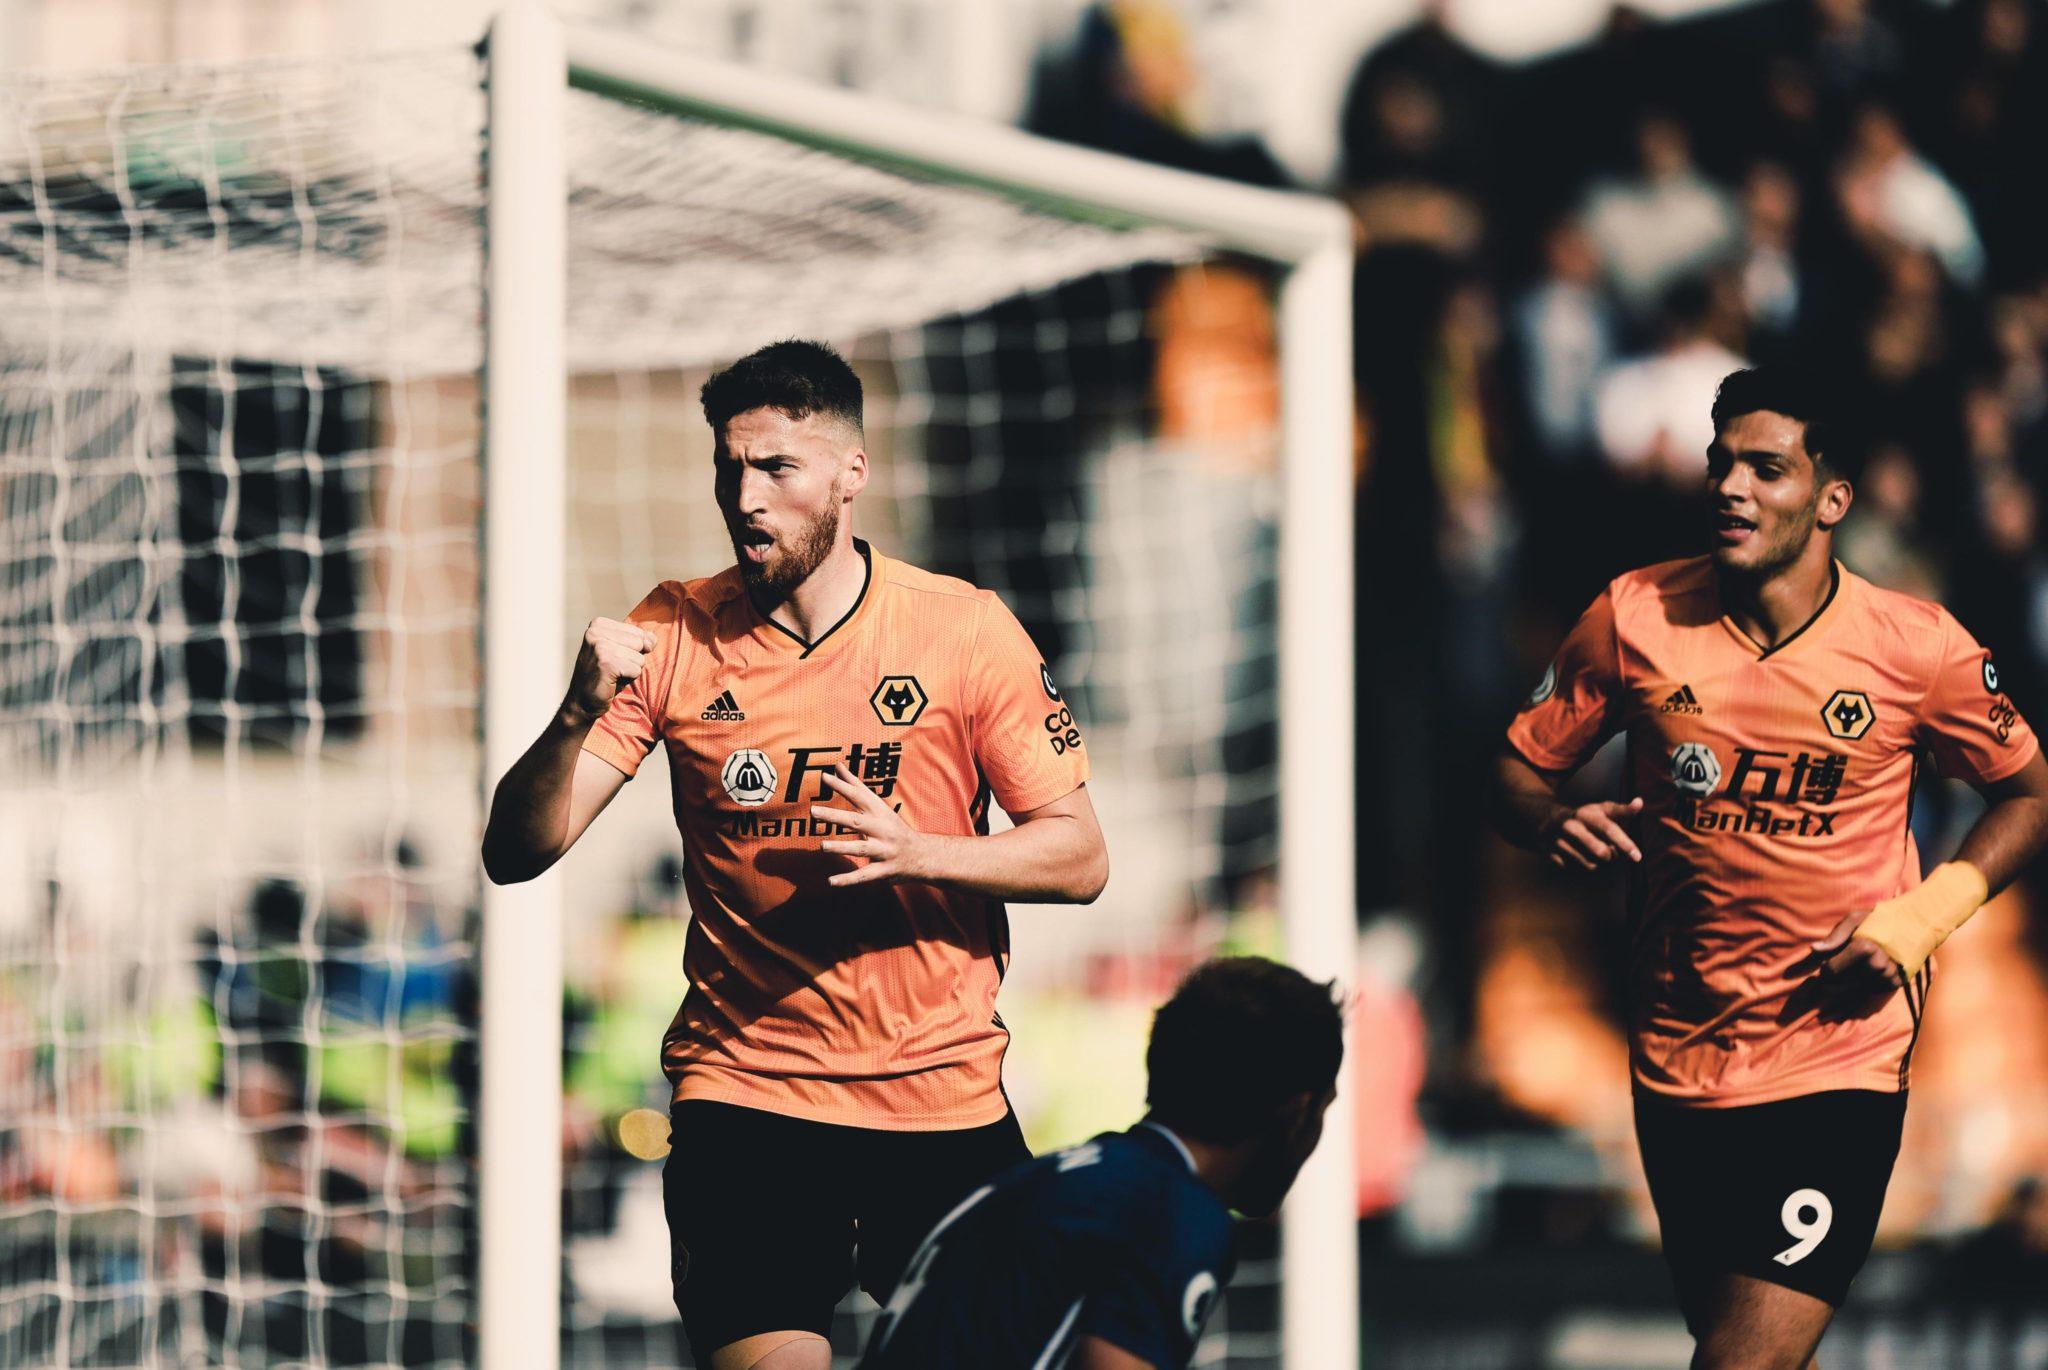 Wolverhampton consiguió valioso triunfo. Foto: Twitter